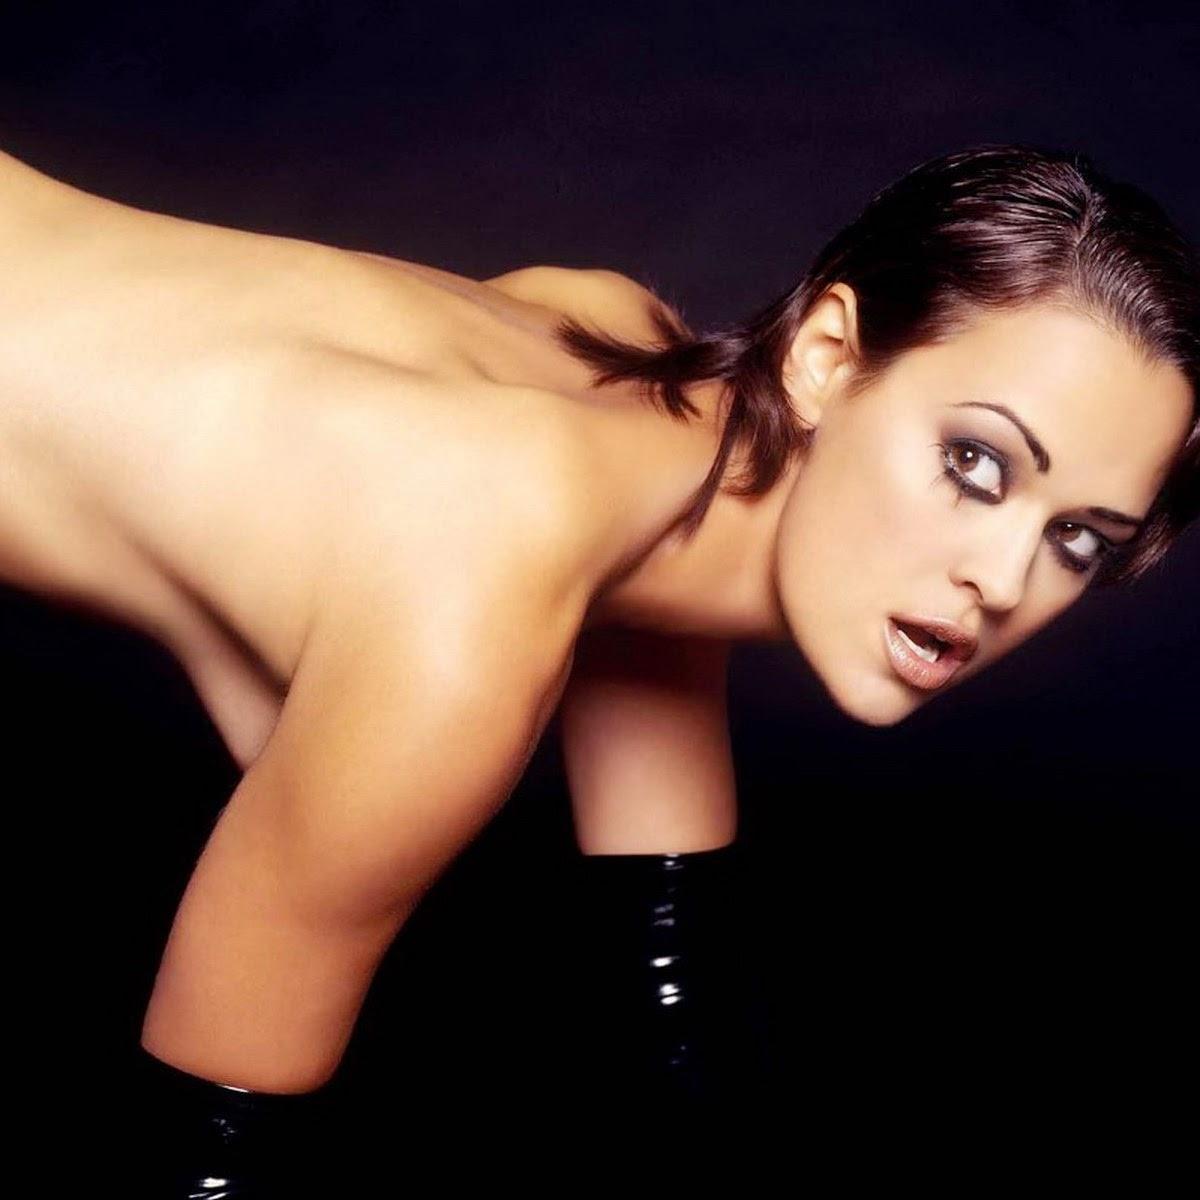 sydney-penny-nude-springer-black-women